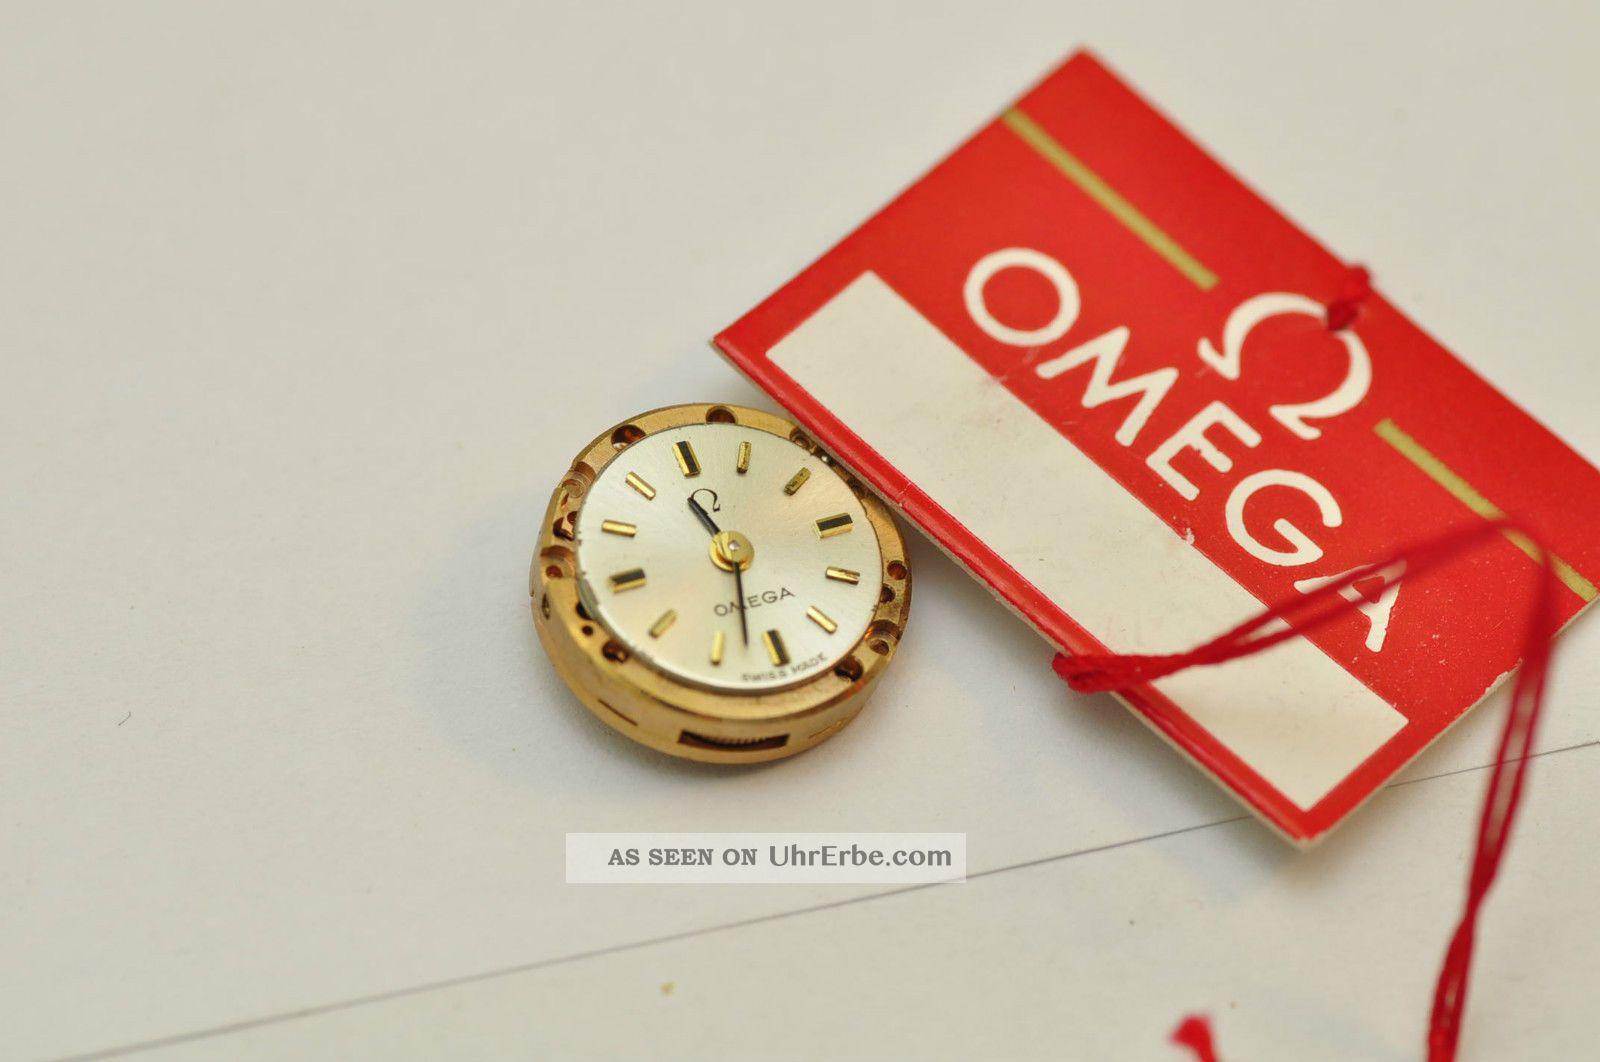 Omega Uhrwerk Werk Cal 640 Movement From Eu Armbanduhren Bild